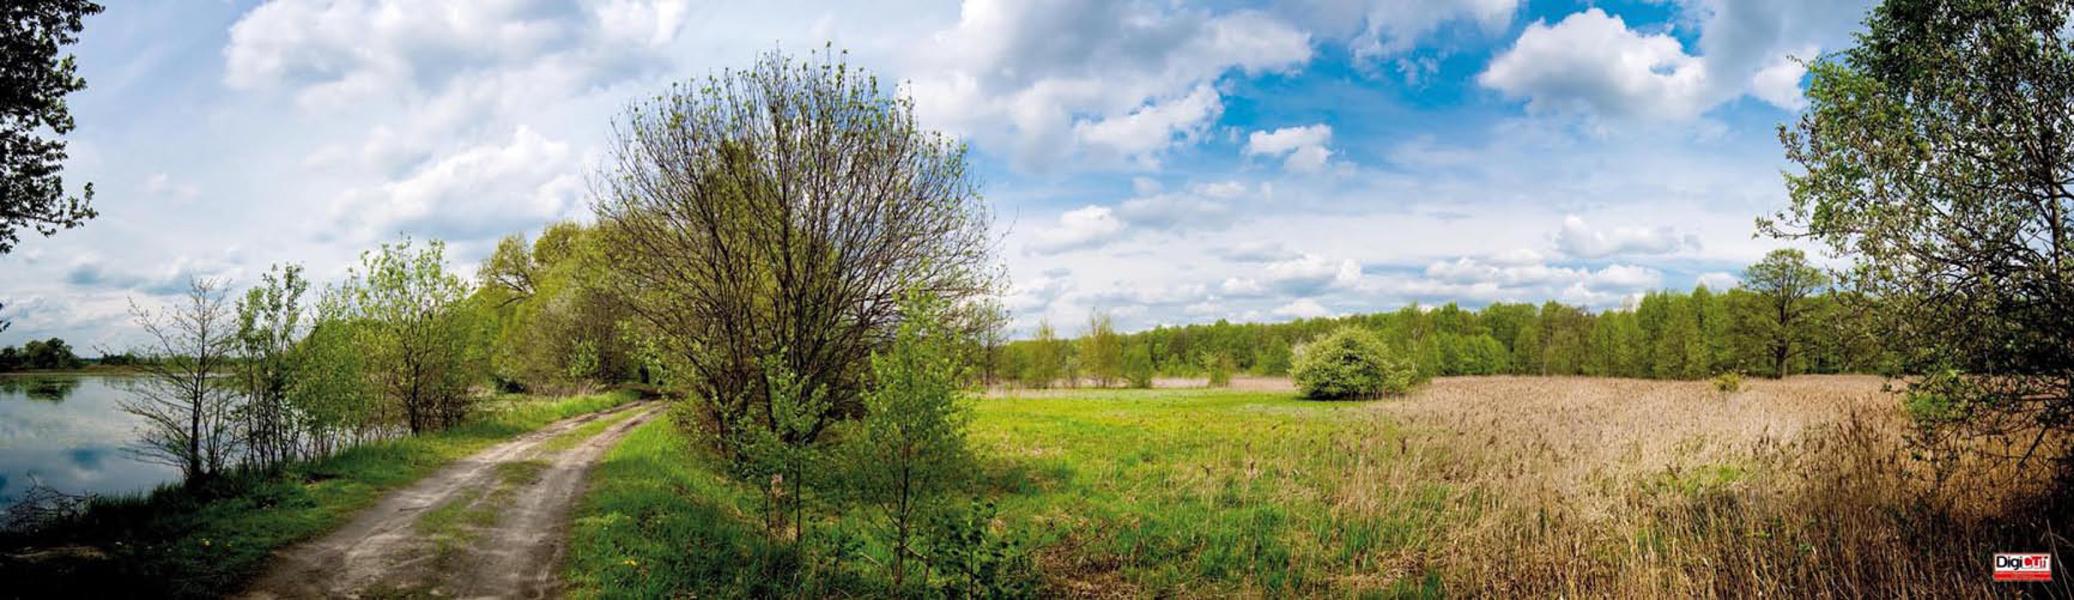 Plane Frühlingslandschaft 110x318 cm